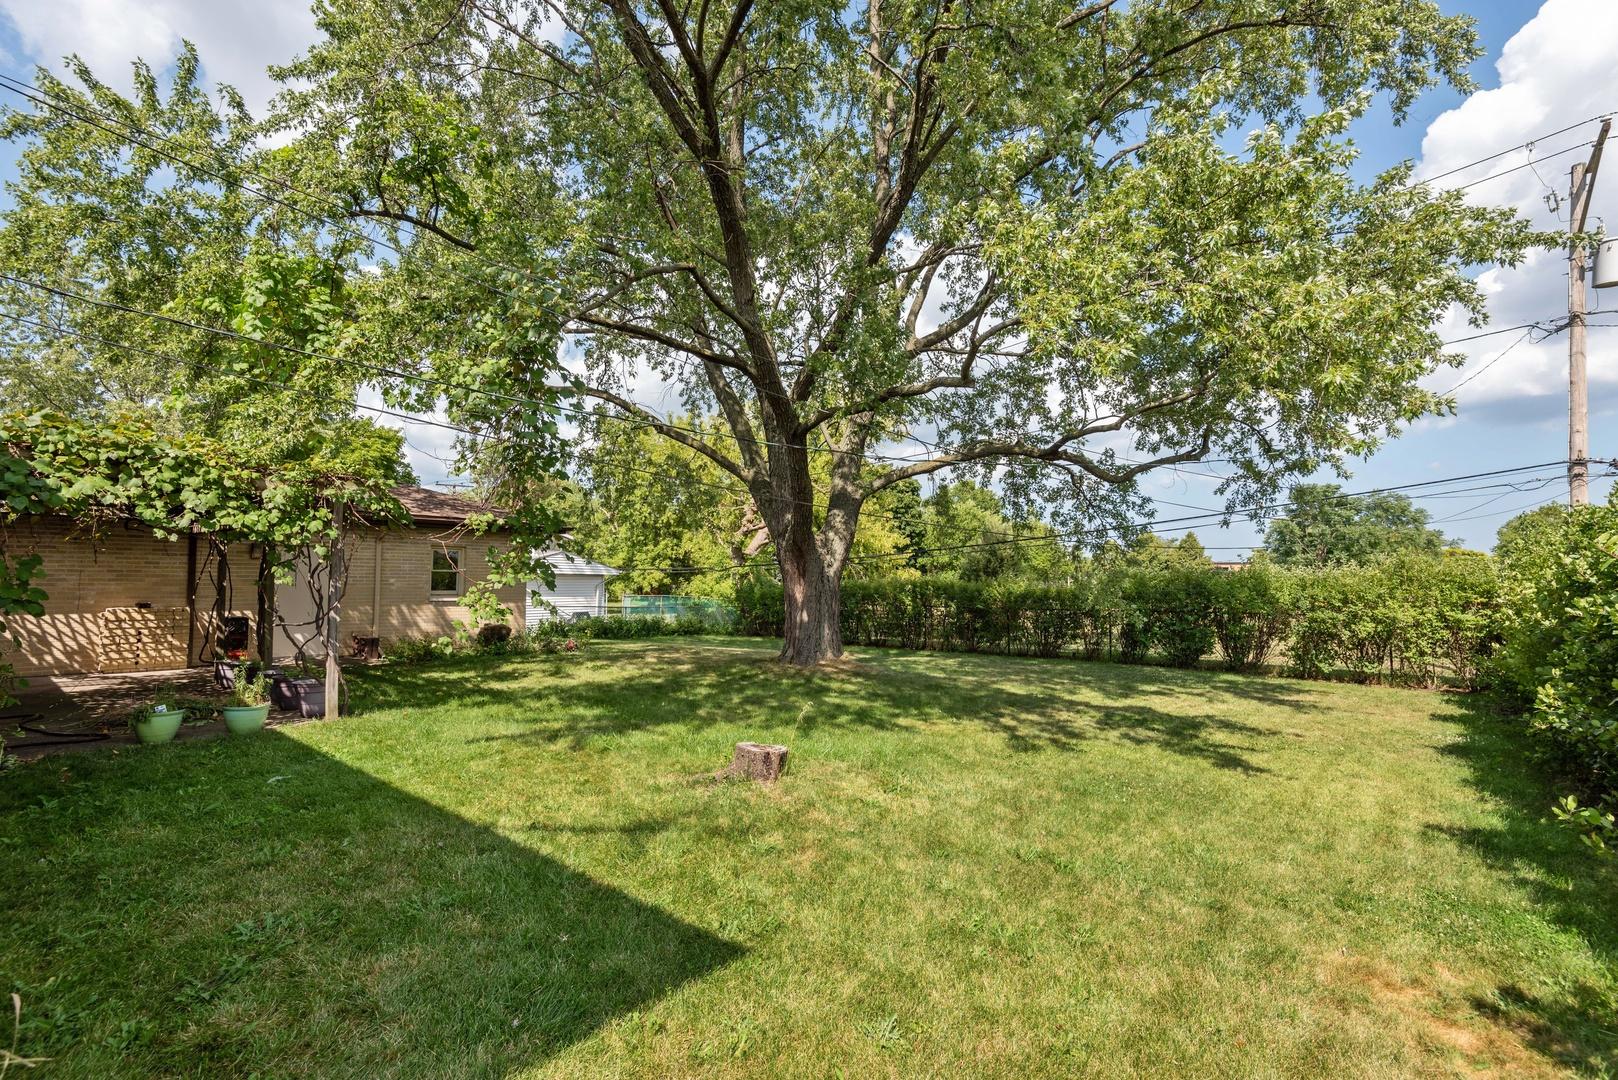 23 Michael Manor, Glenview, Illinois, 60025